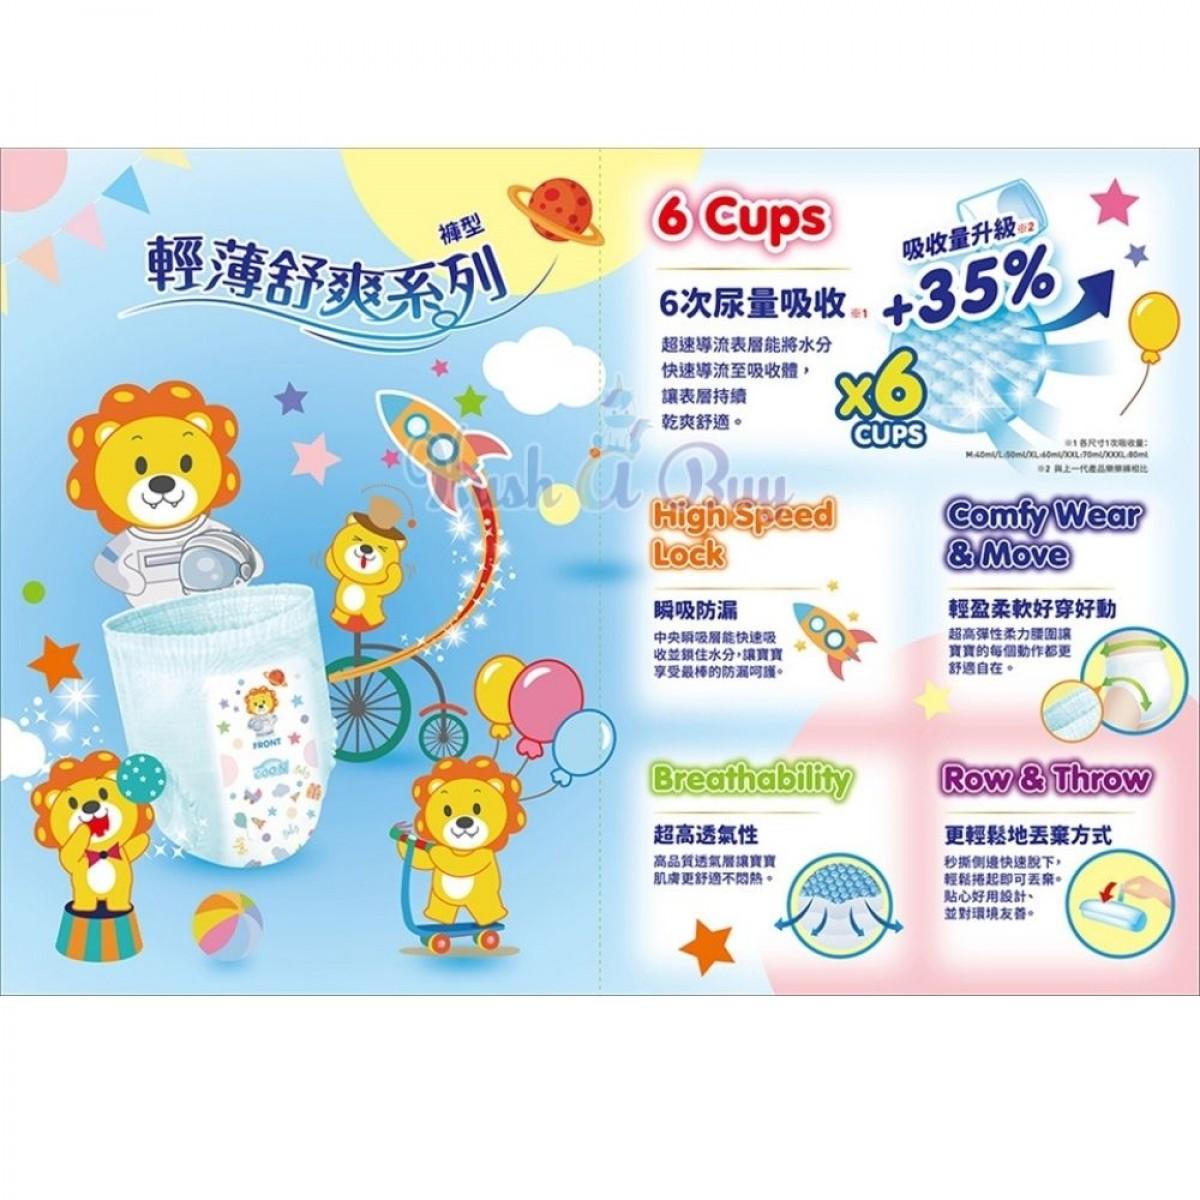 1 CTN (3 Packs) Goo.N GOON Premium Pants Diapers (for Boy & Girl)  - XXXL Super Jumbo Pack - 18-30kg (26pcs) - Japan Quality